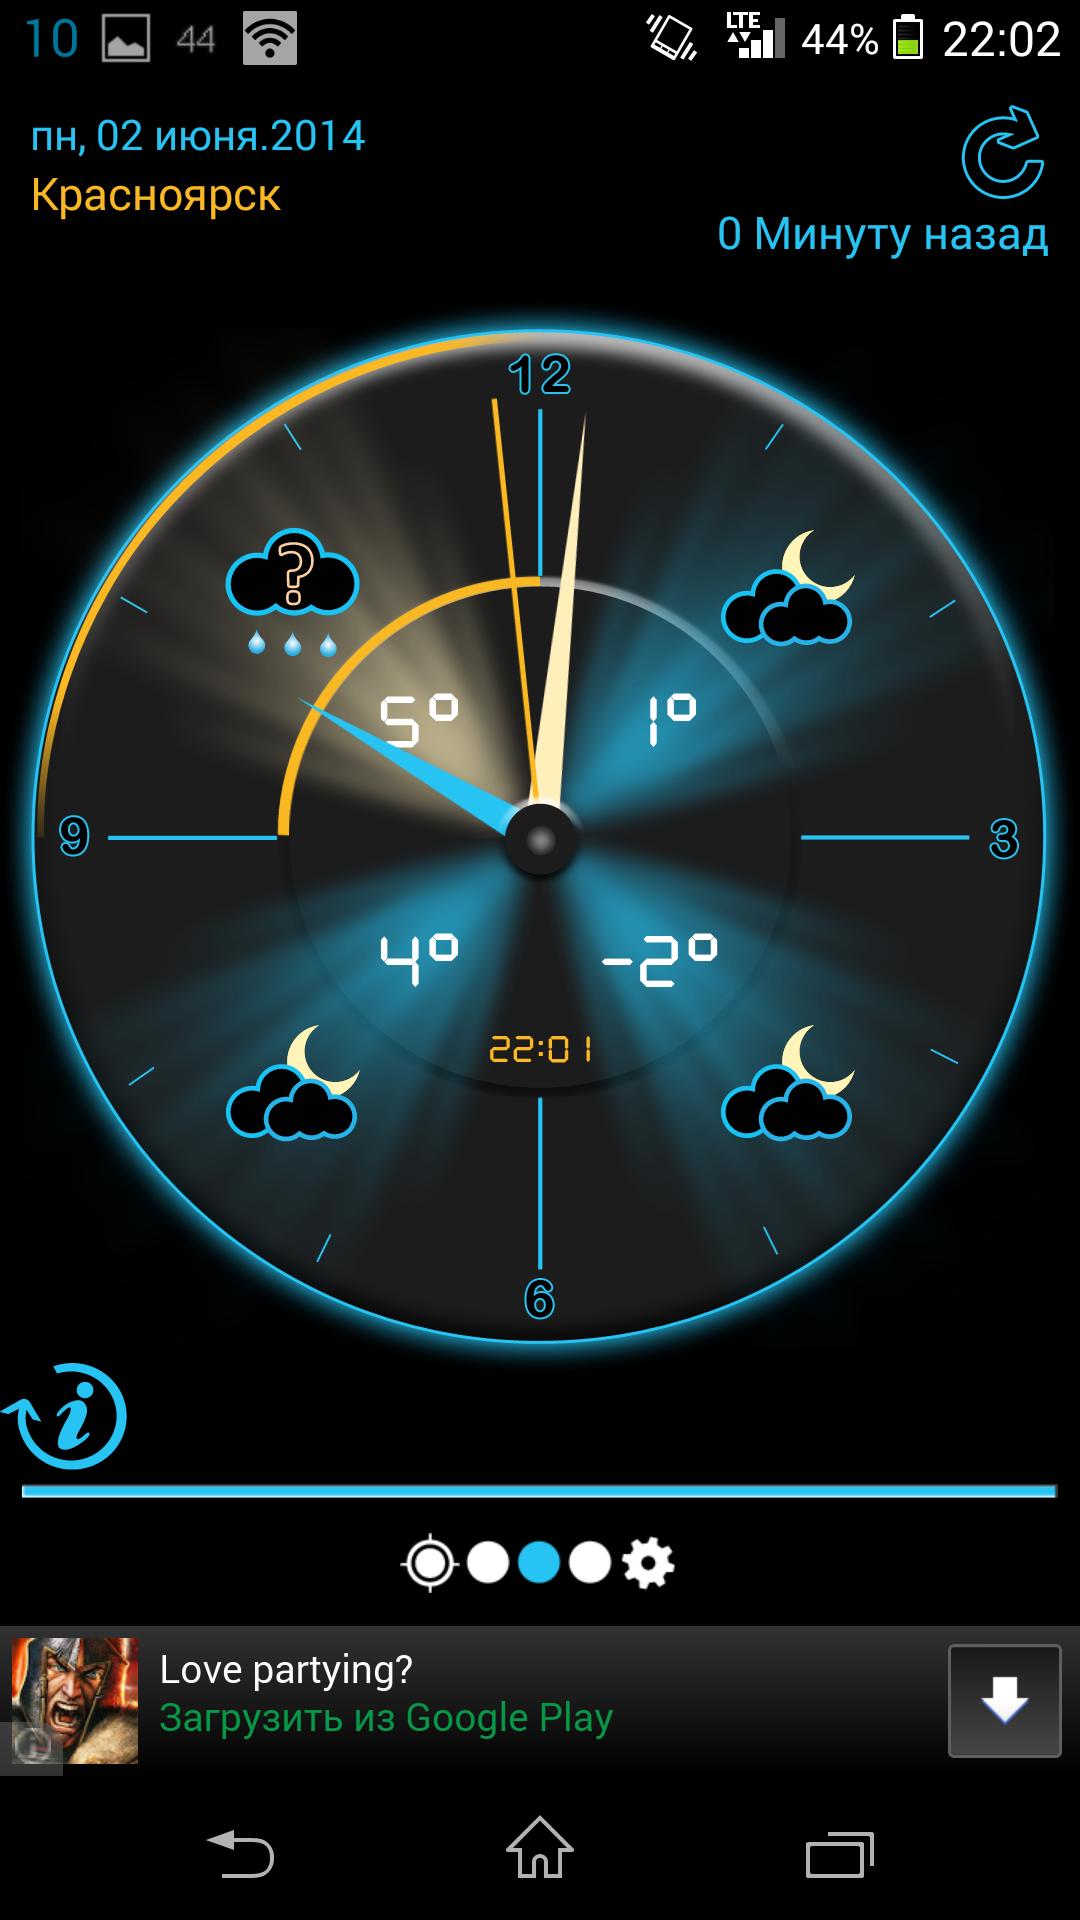 Виджеты погоды для андроид.